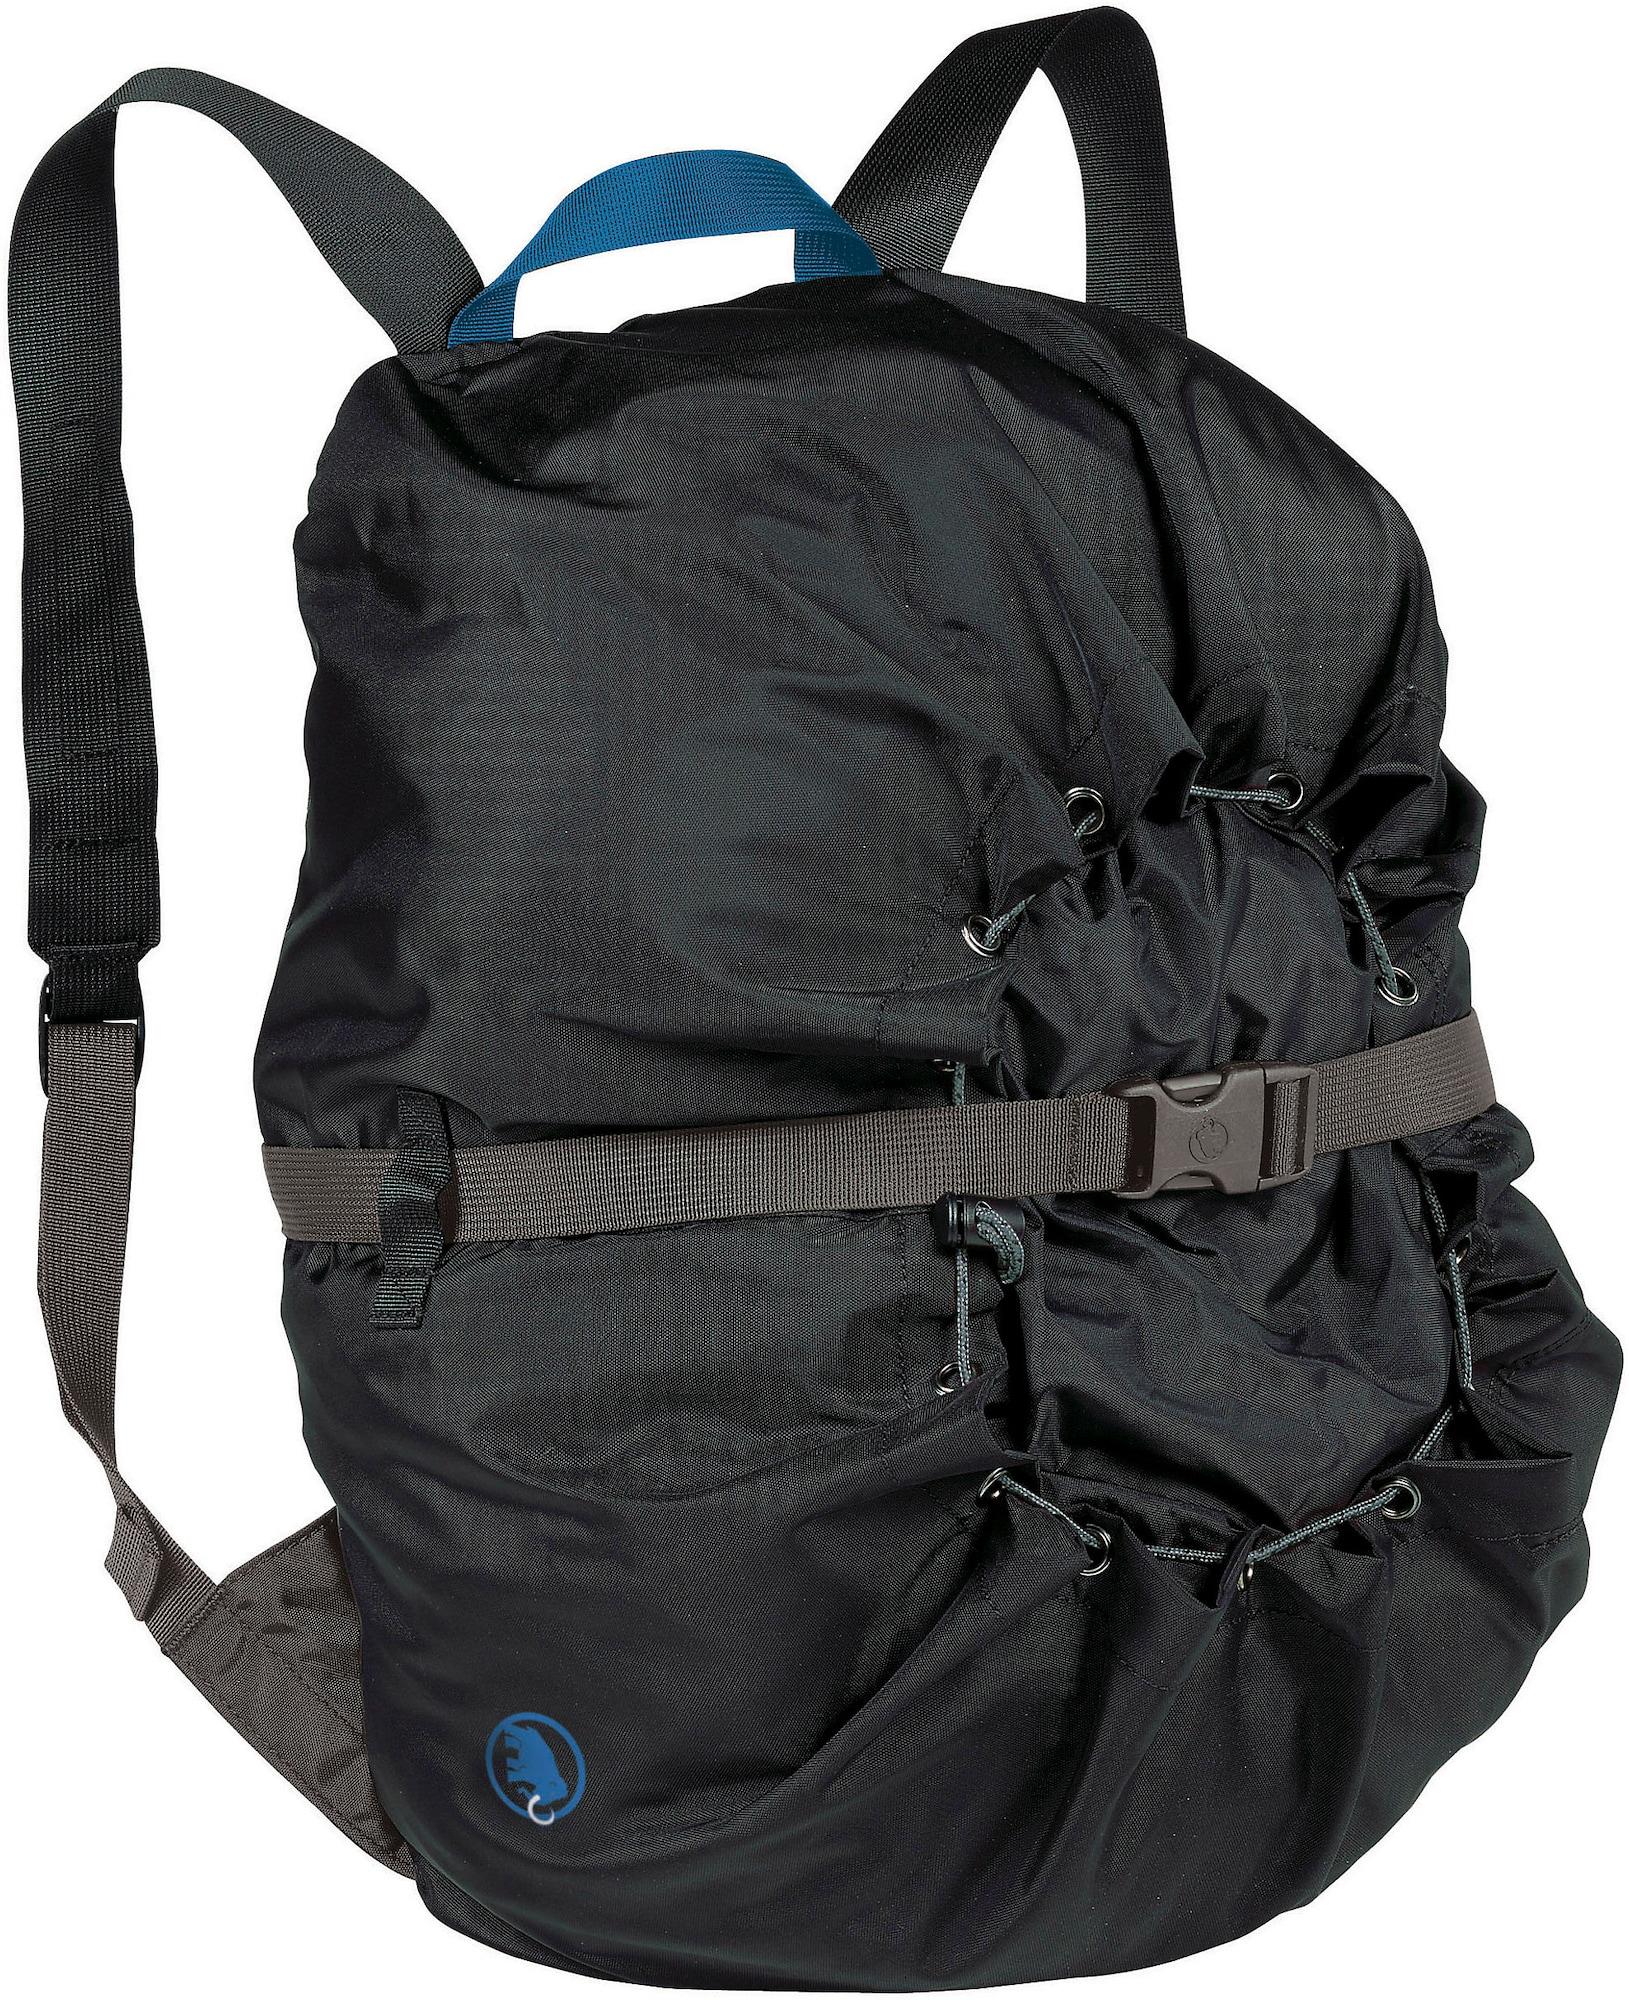 Element Seilsack   Taschen > Rucksäcke > Trekkingrucksäcke   Schwarz   mammut